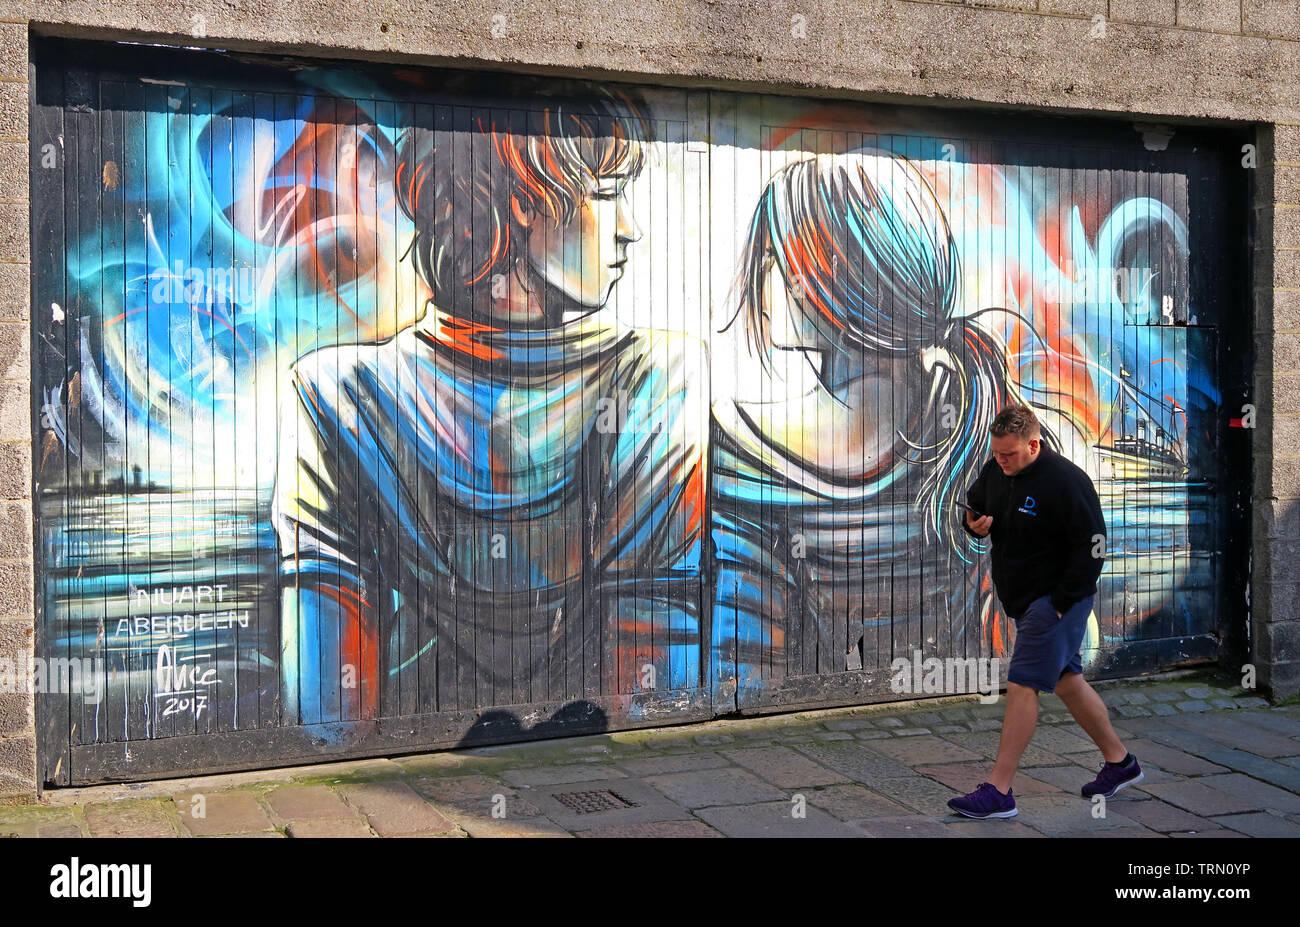 GoTonySmith,@HotpixUK,HotpixUK,North East,North East Scotland,Scottish,UK,City Centre,The Granite City,Northeast,Shiprow,art,artwork,person walking,walker,two people,Shiprow street Art,murals,Nuart,festival,Aberdeen,street art festival,April 2017,award winning,national award,artist,Nuart Aberdeen,Aberdeen Inspired